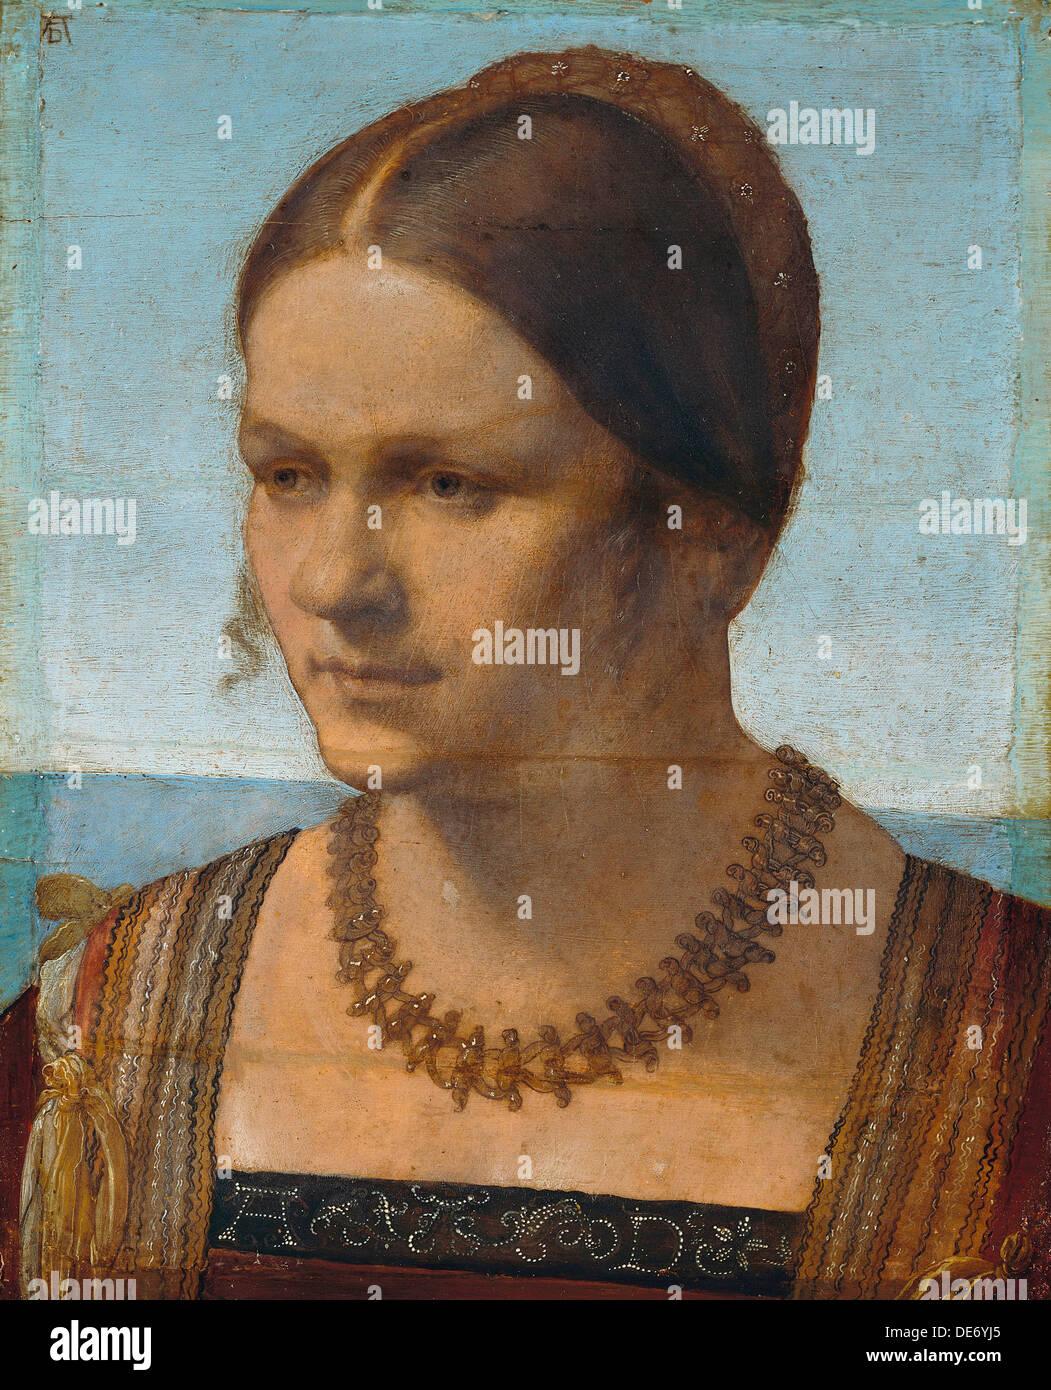 Portrait of a Young Venetian Lady, 1506. Artist: Dürer, Albrecht (1471-1528) - Stock Image